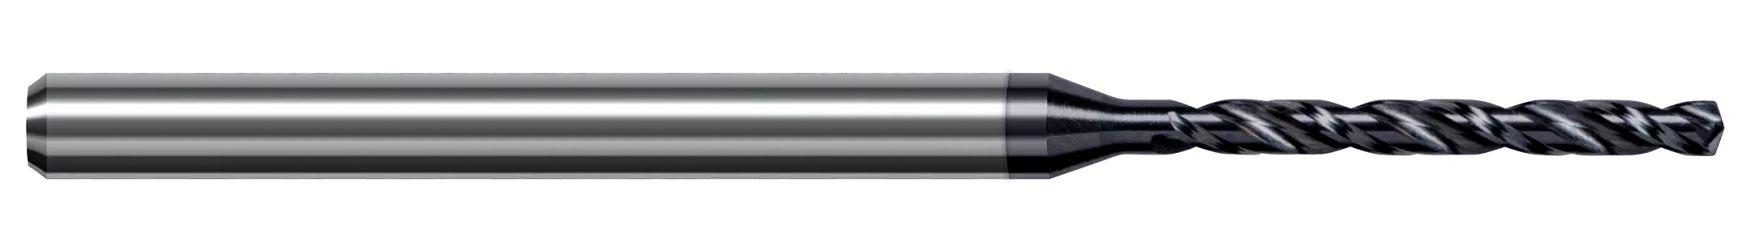 Miniature High Performance Drills - Hardened Steels